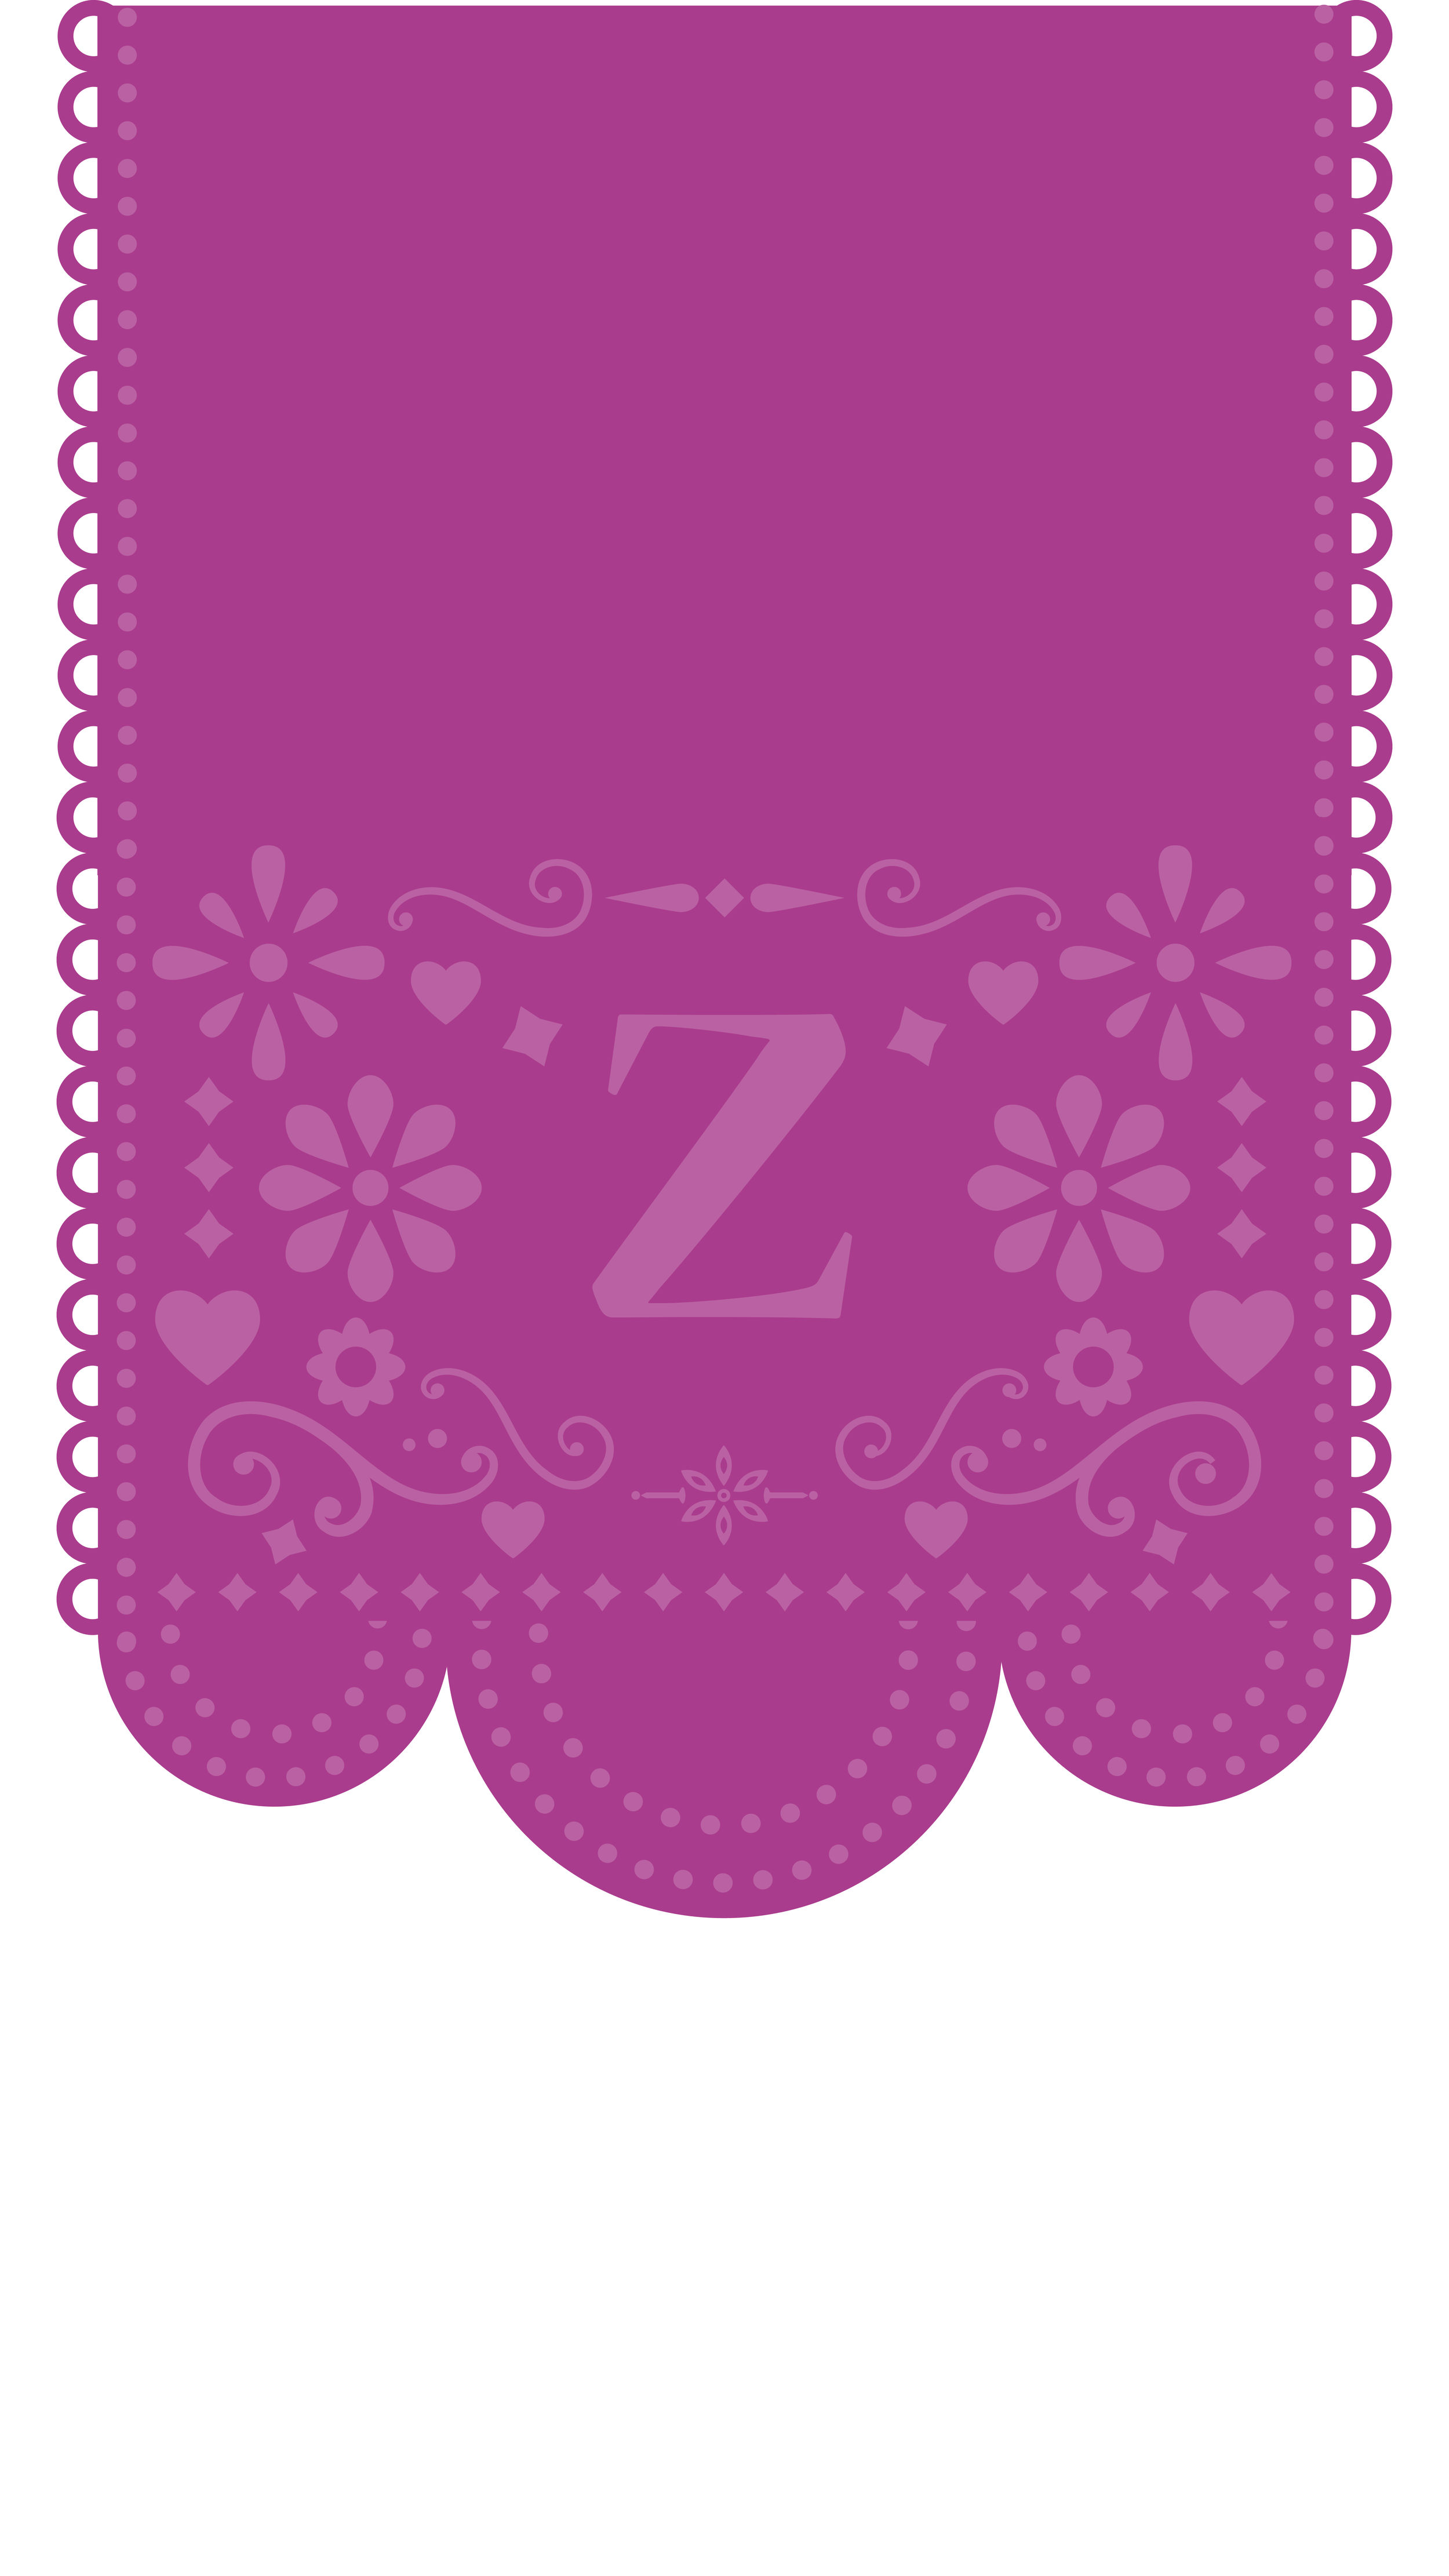 z-fiesta-banner.png